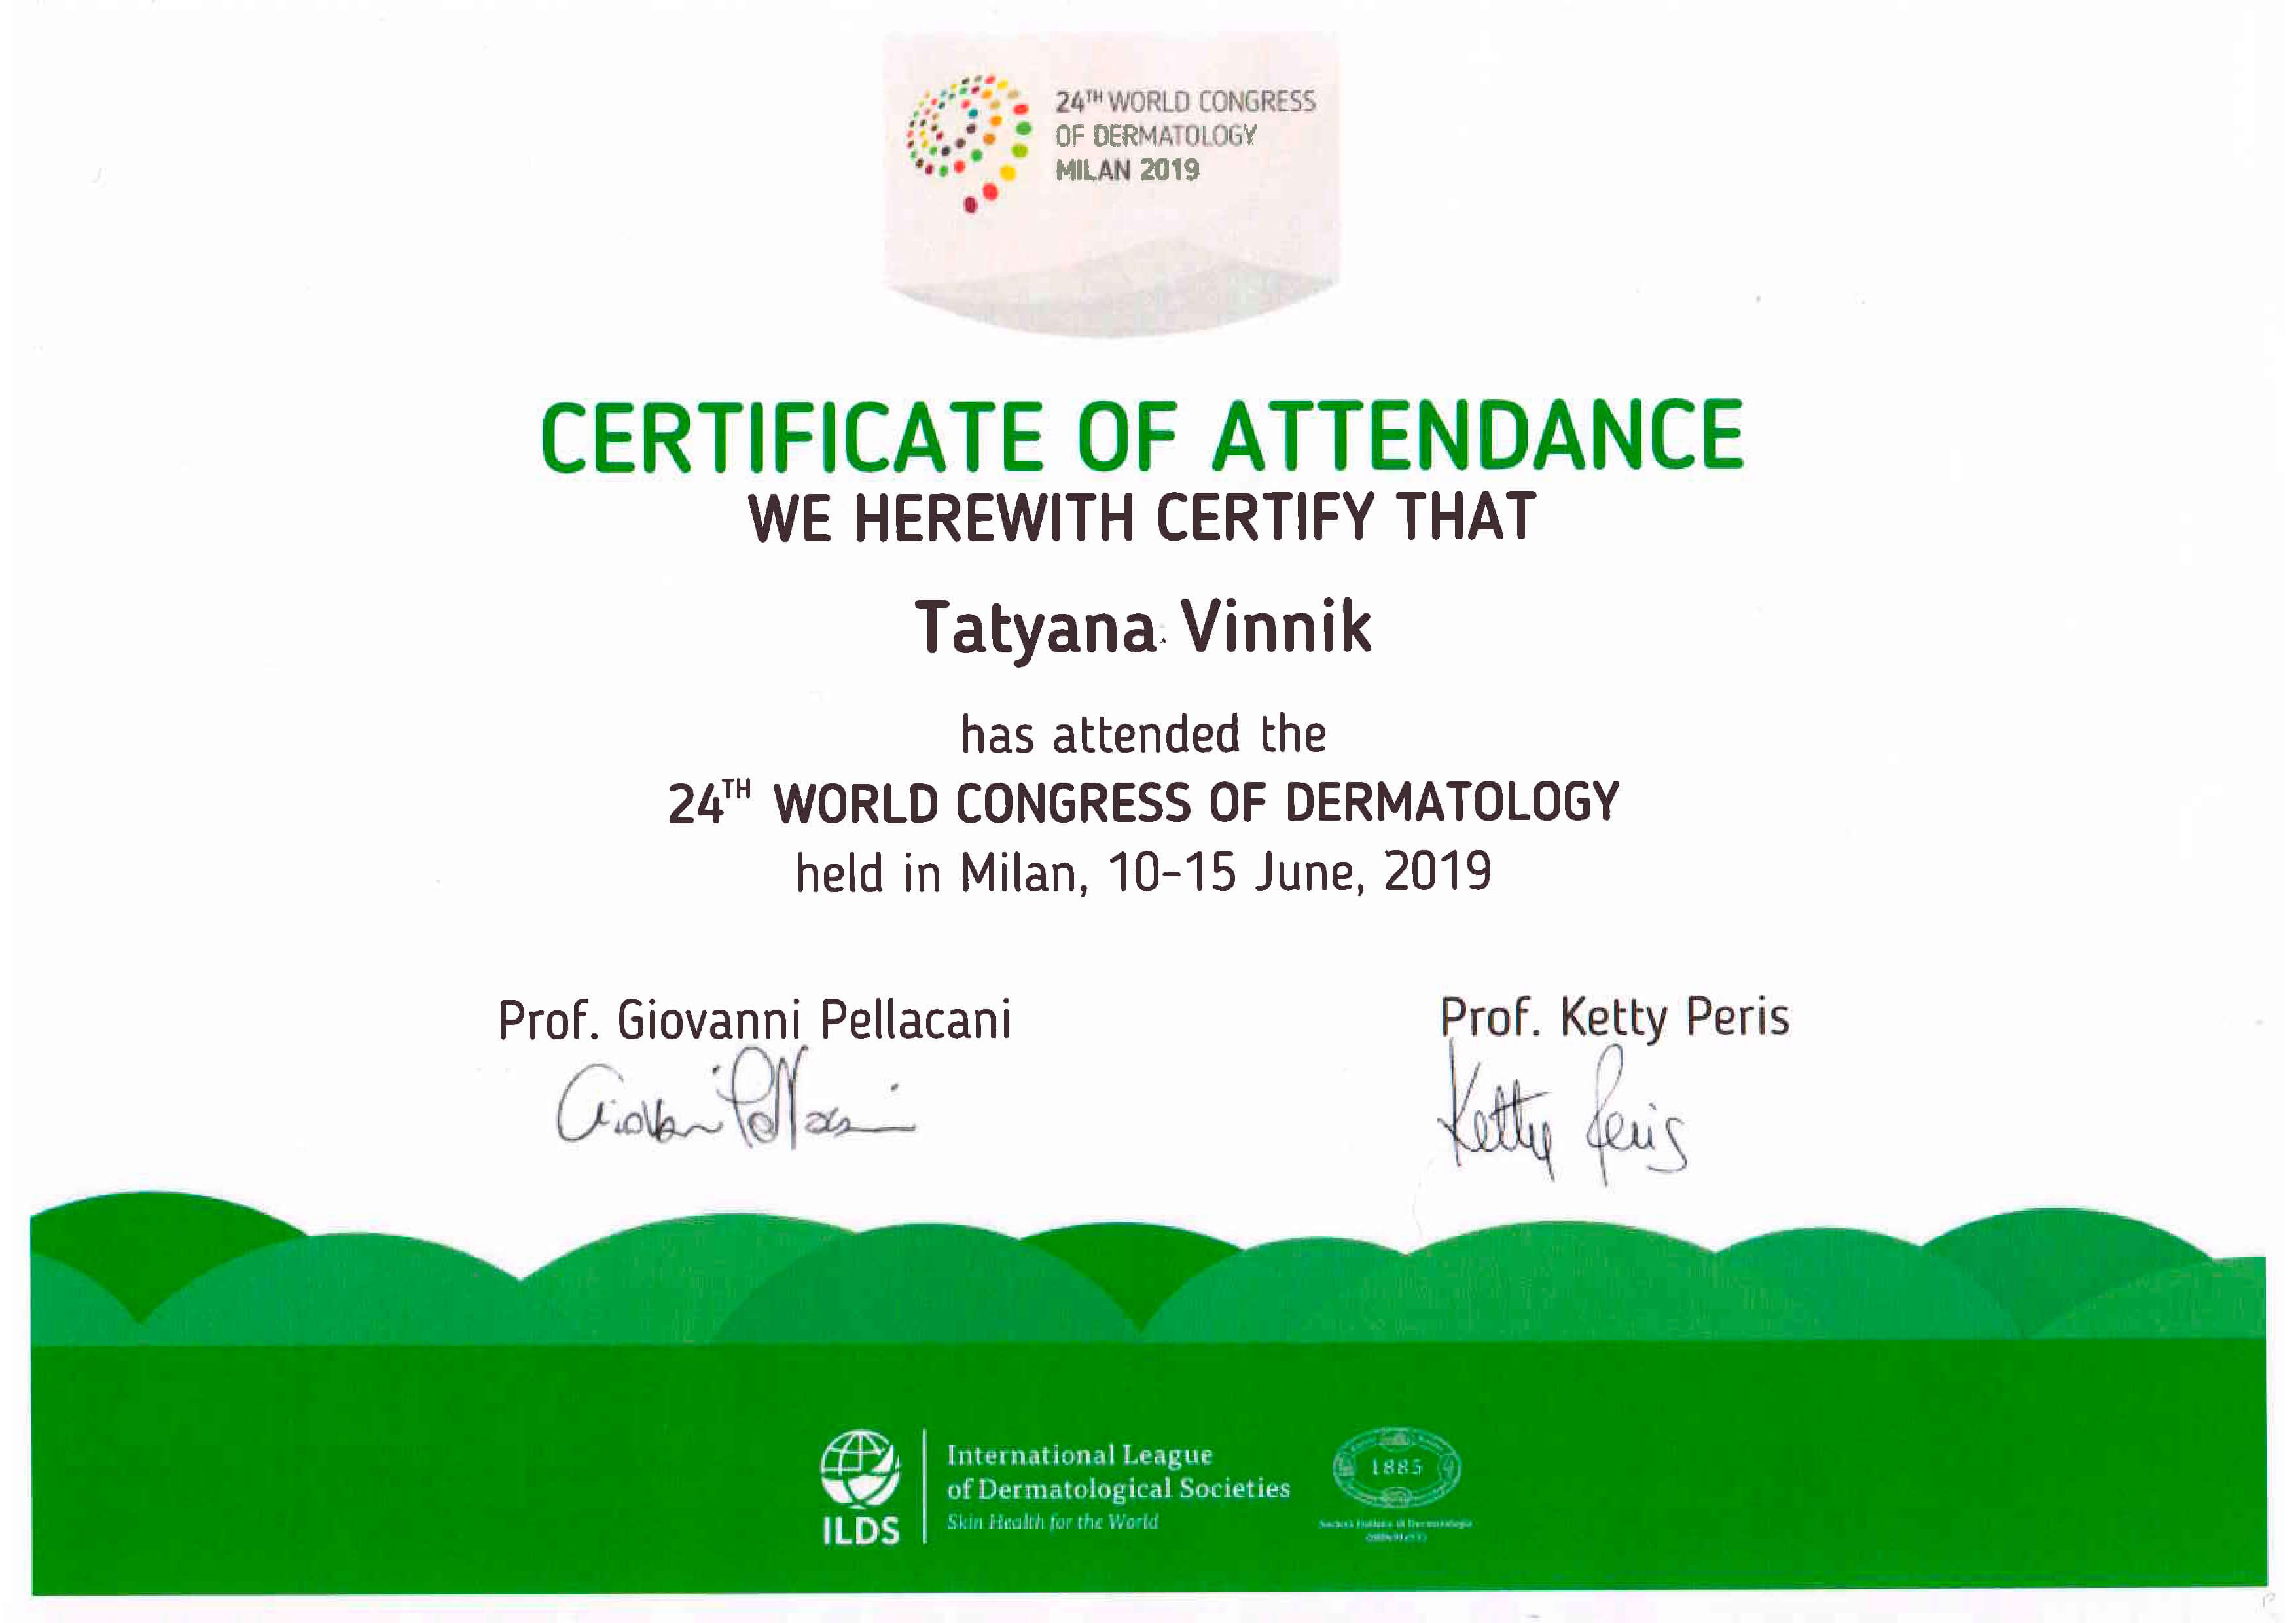 World Congress of Dermatology 2019, Milan, Italy - viclinics kz